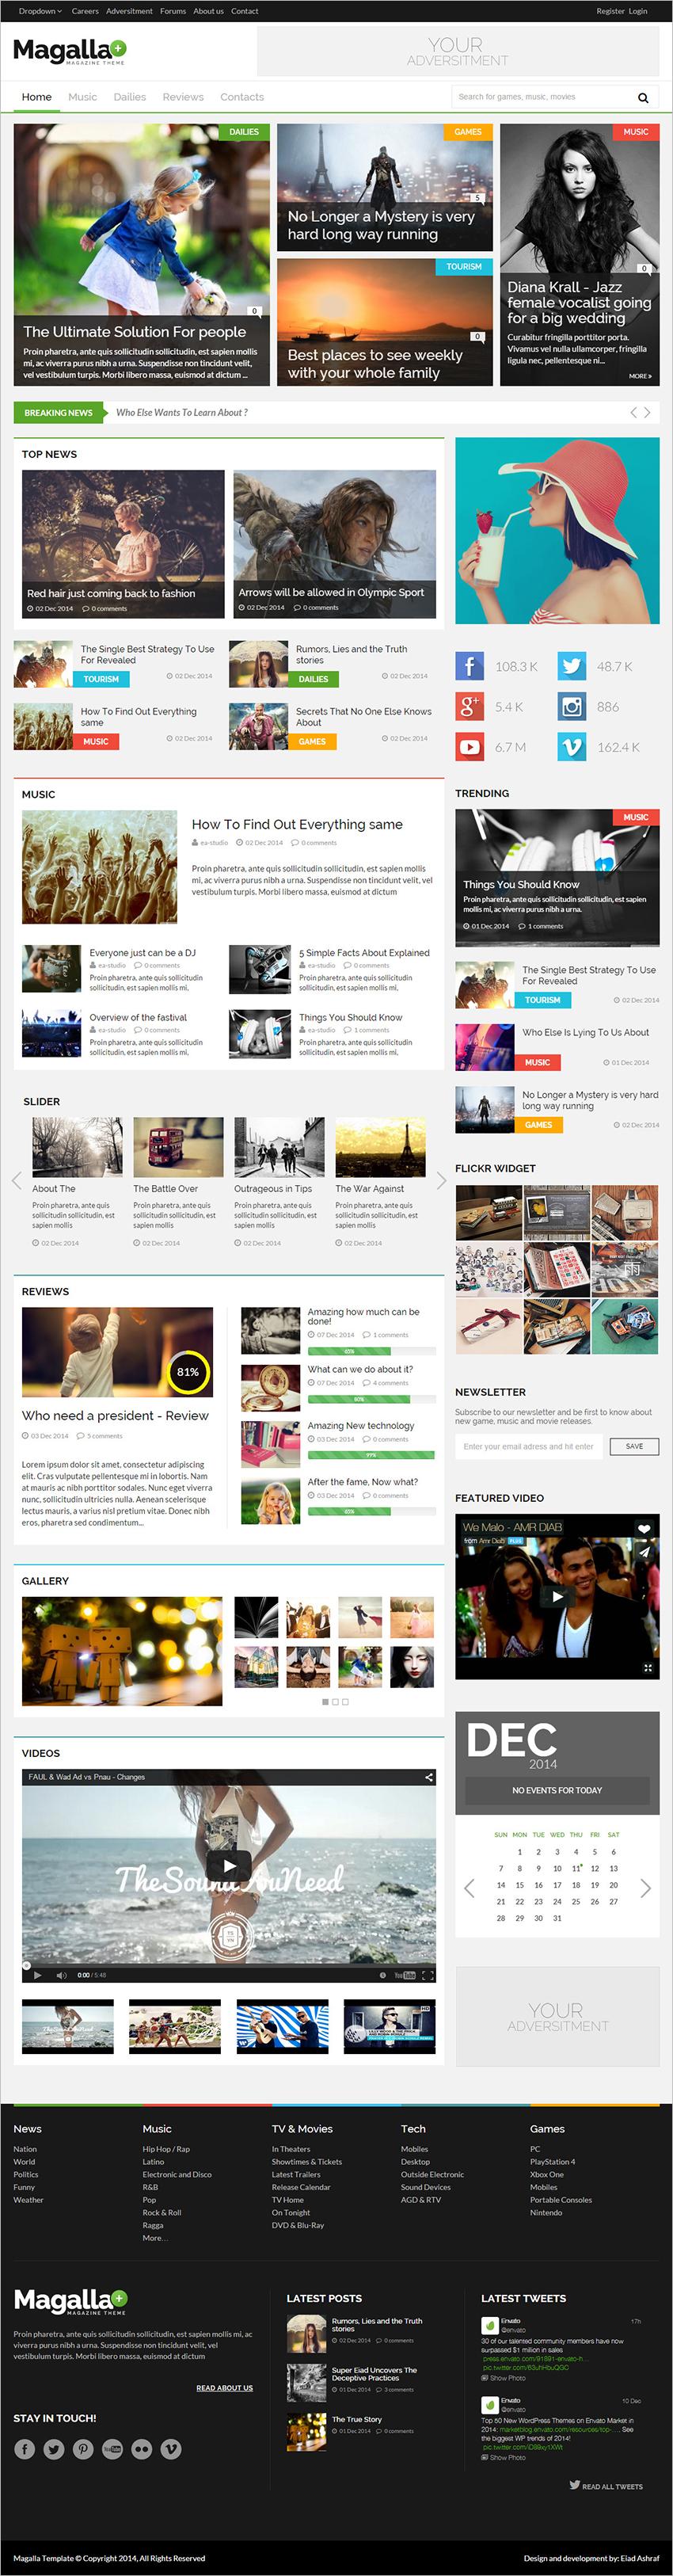 SEO Optimized Business Blog